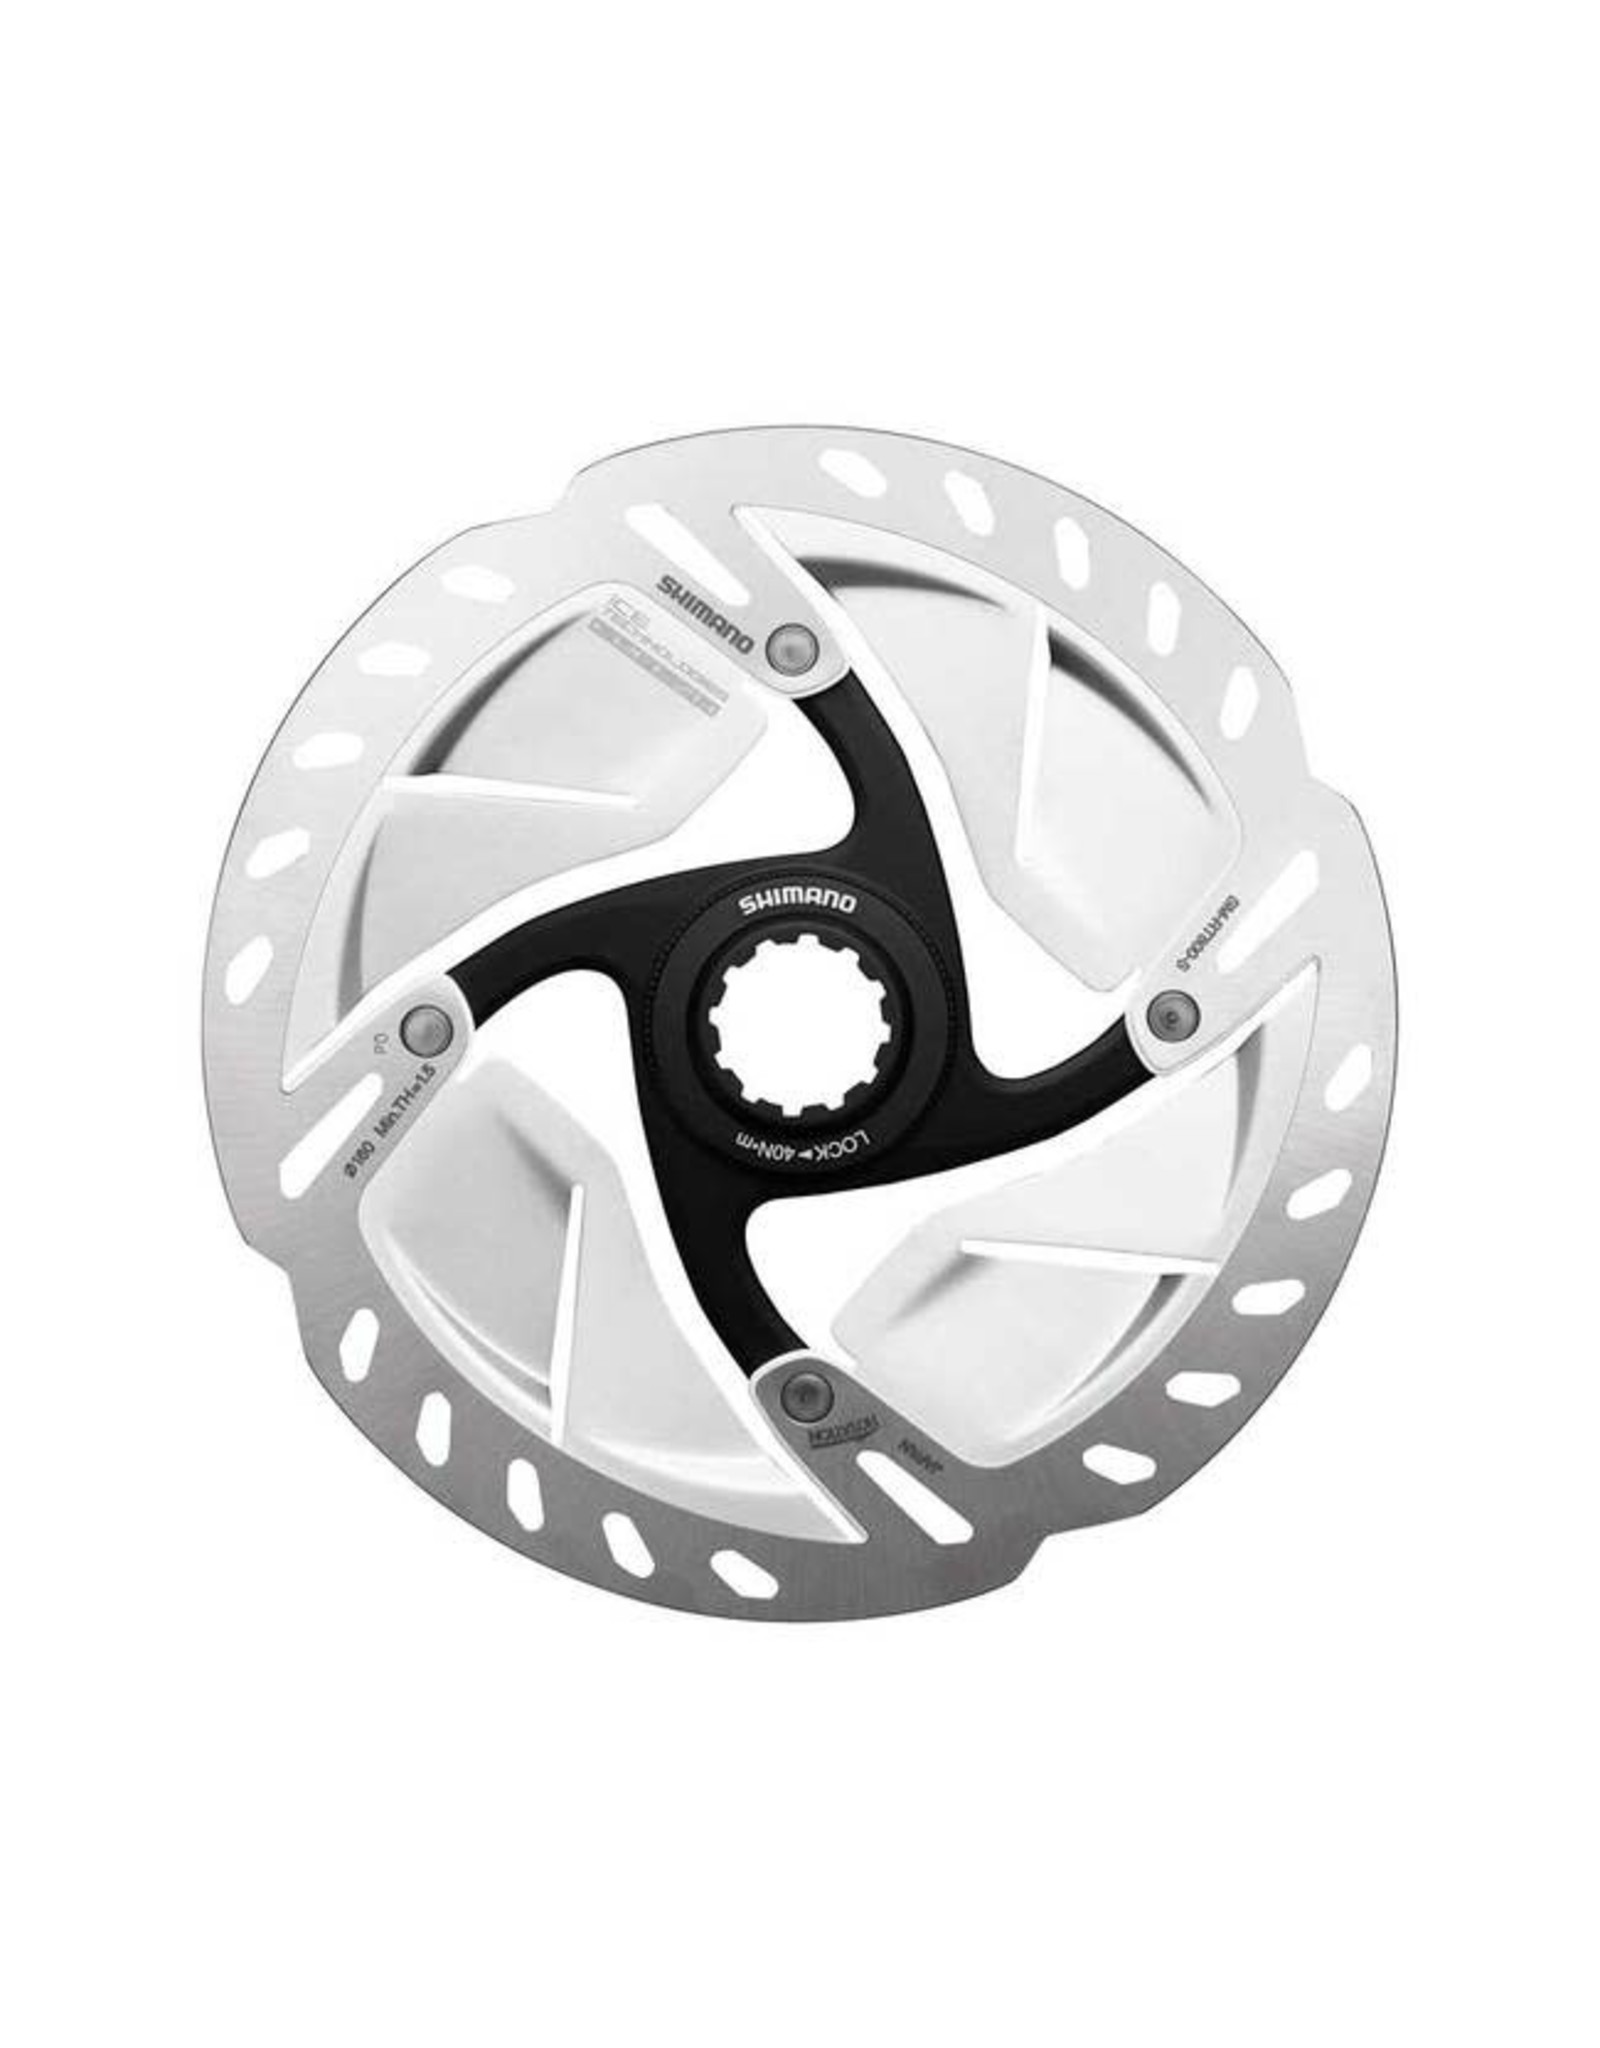 Shimano Shimano Ultegra SM-RT800-SS Disc Brake Rotor - 140mm, Center Lock, Silver